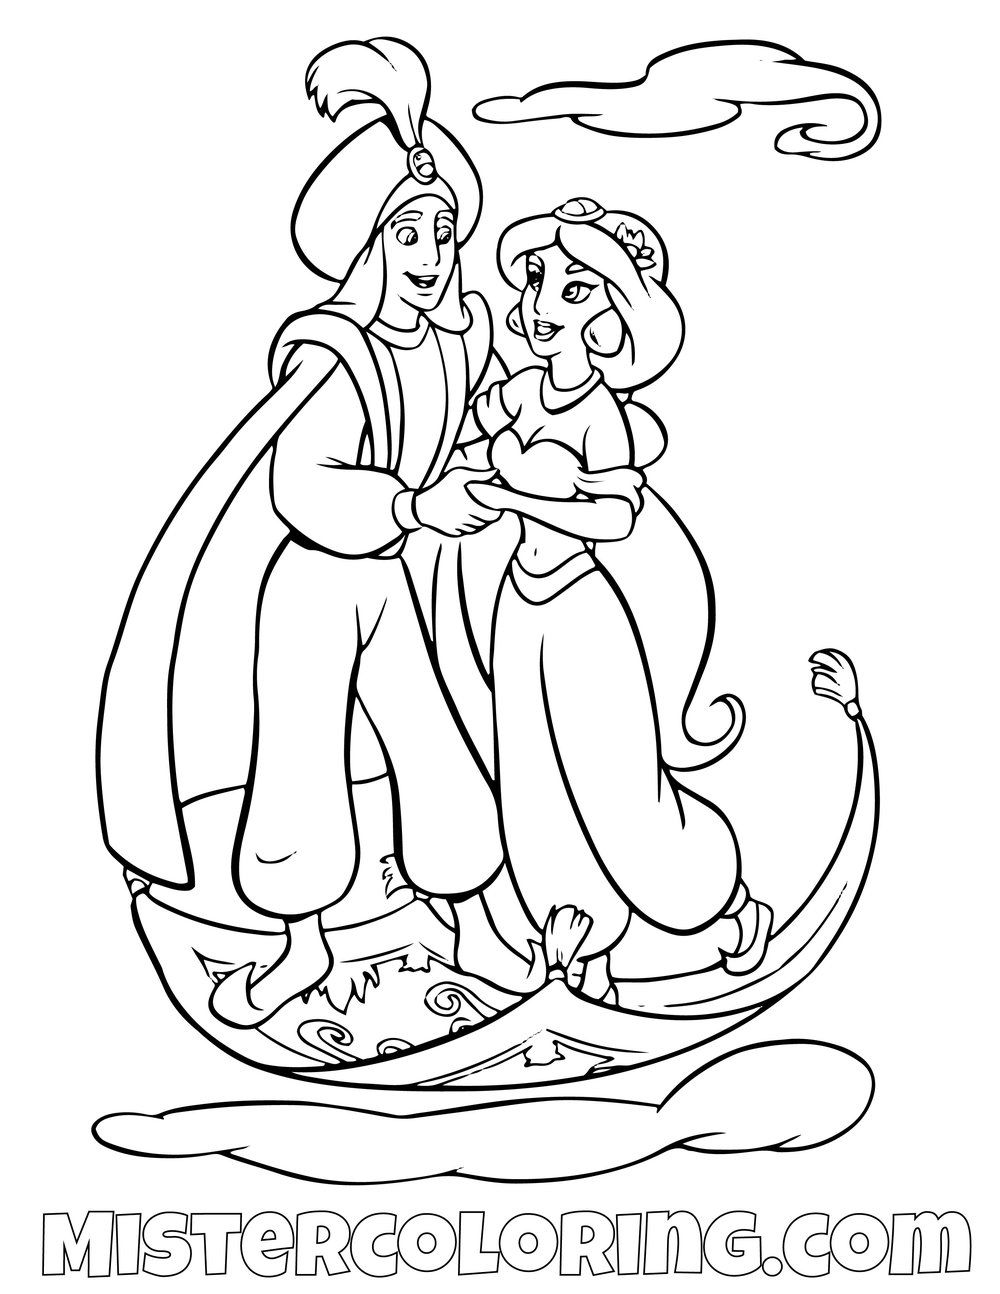 Aladdin And Princess Jasmine Riding Carpet Aladdin Coloring Page Disney Coloring Pages Cartoon Coloring Pages Love Coloring Pages